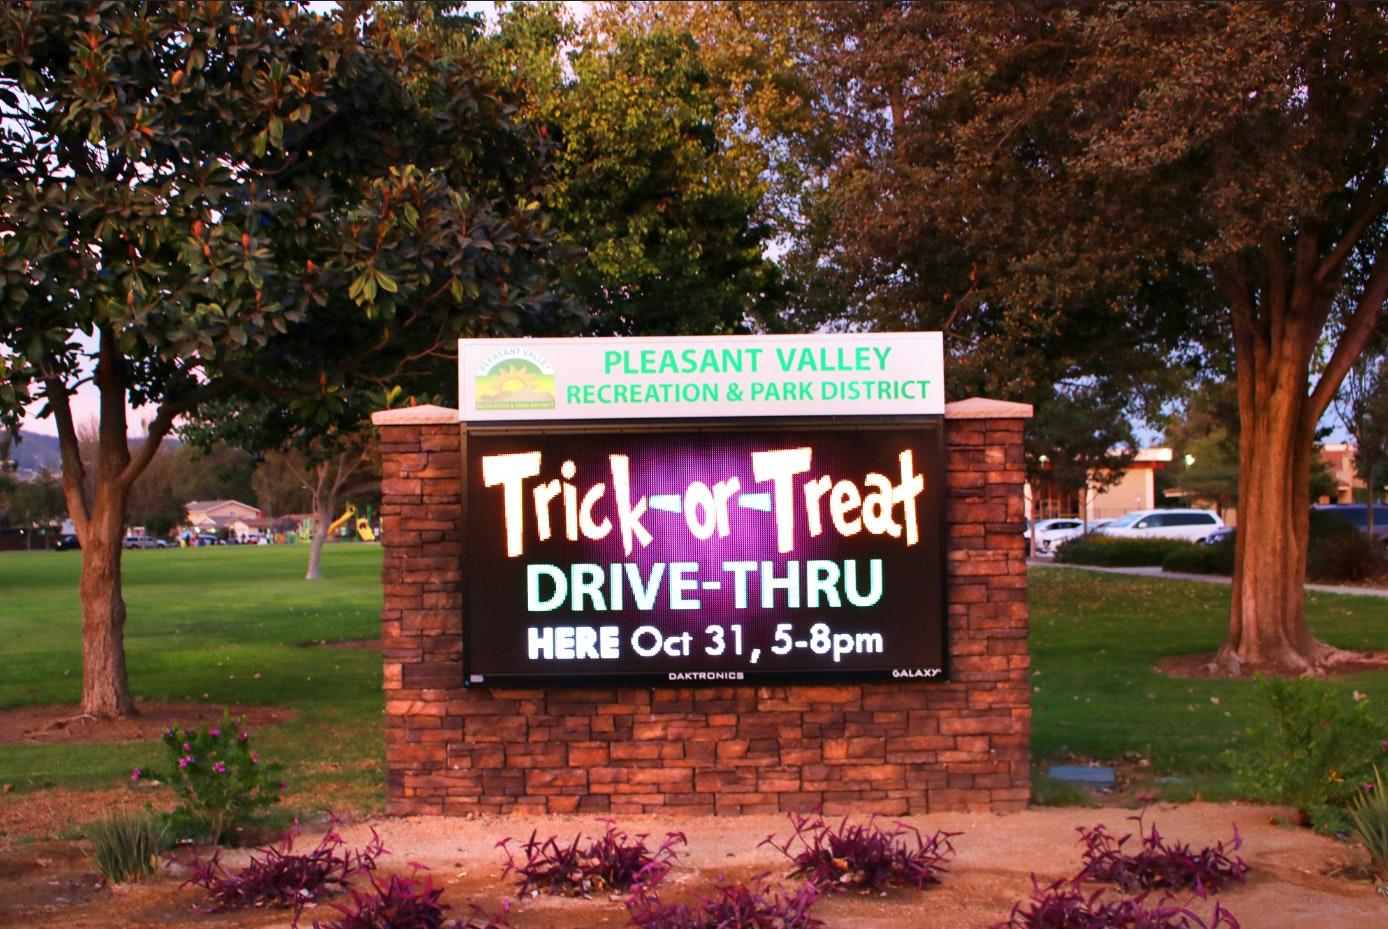 Trick-Or-Treat Drive-Thru